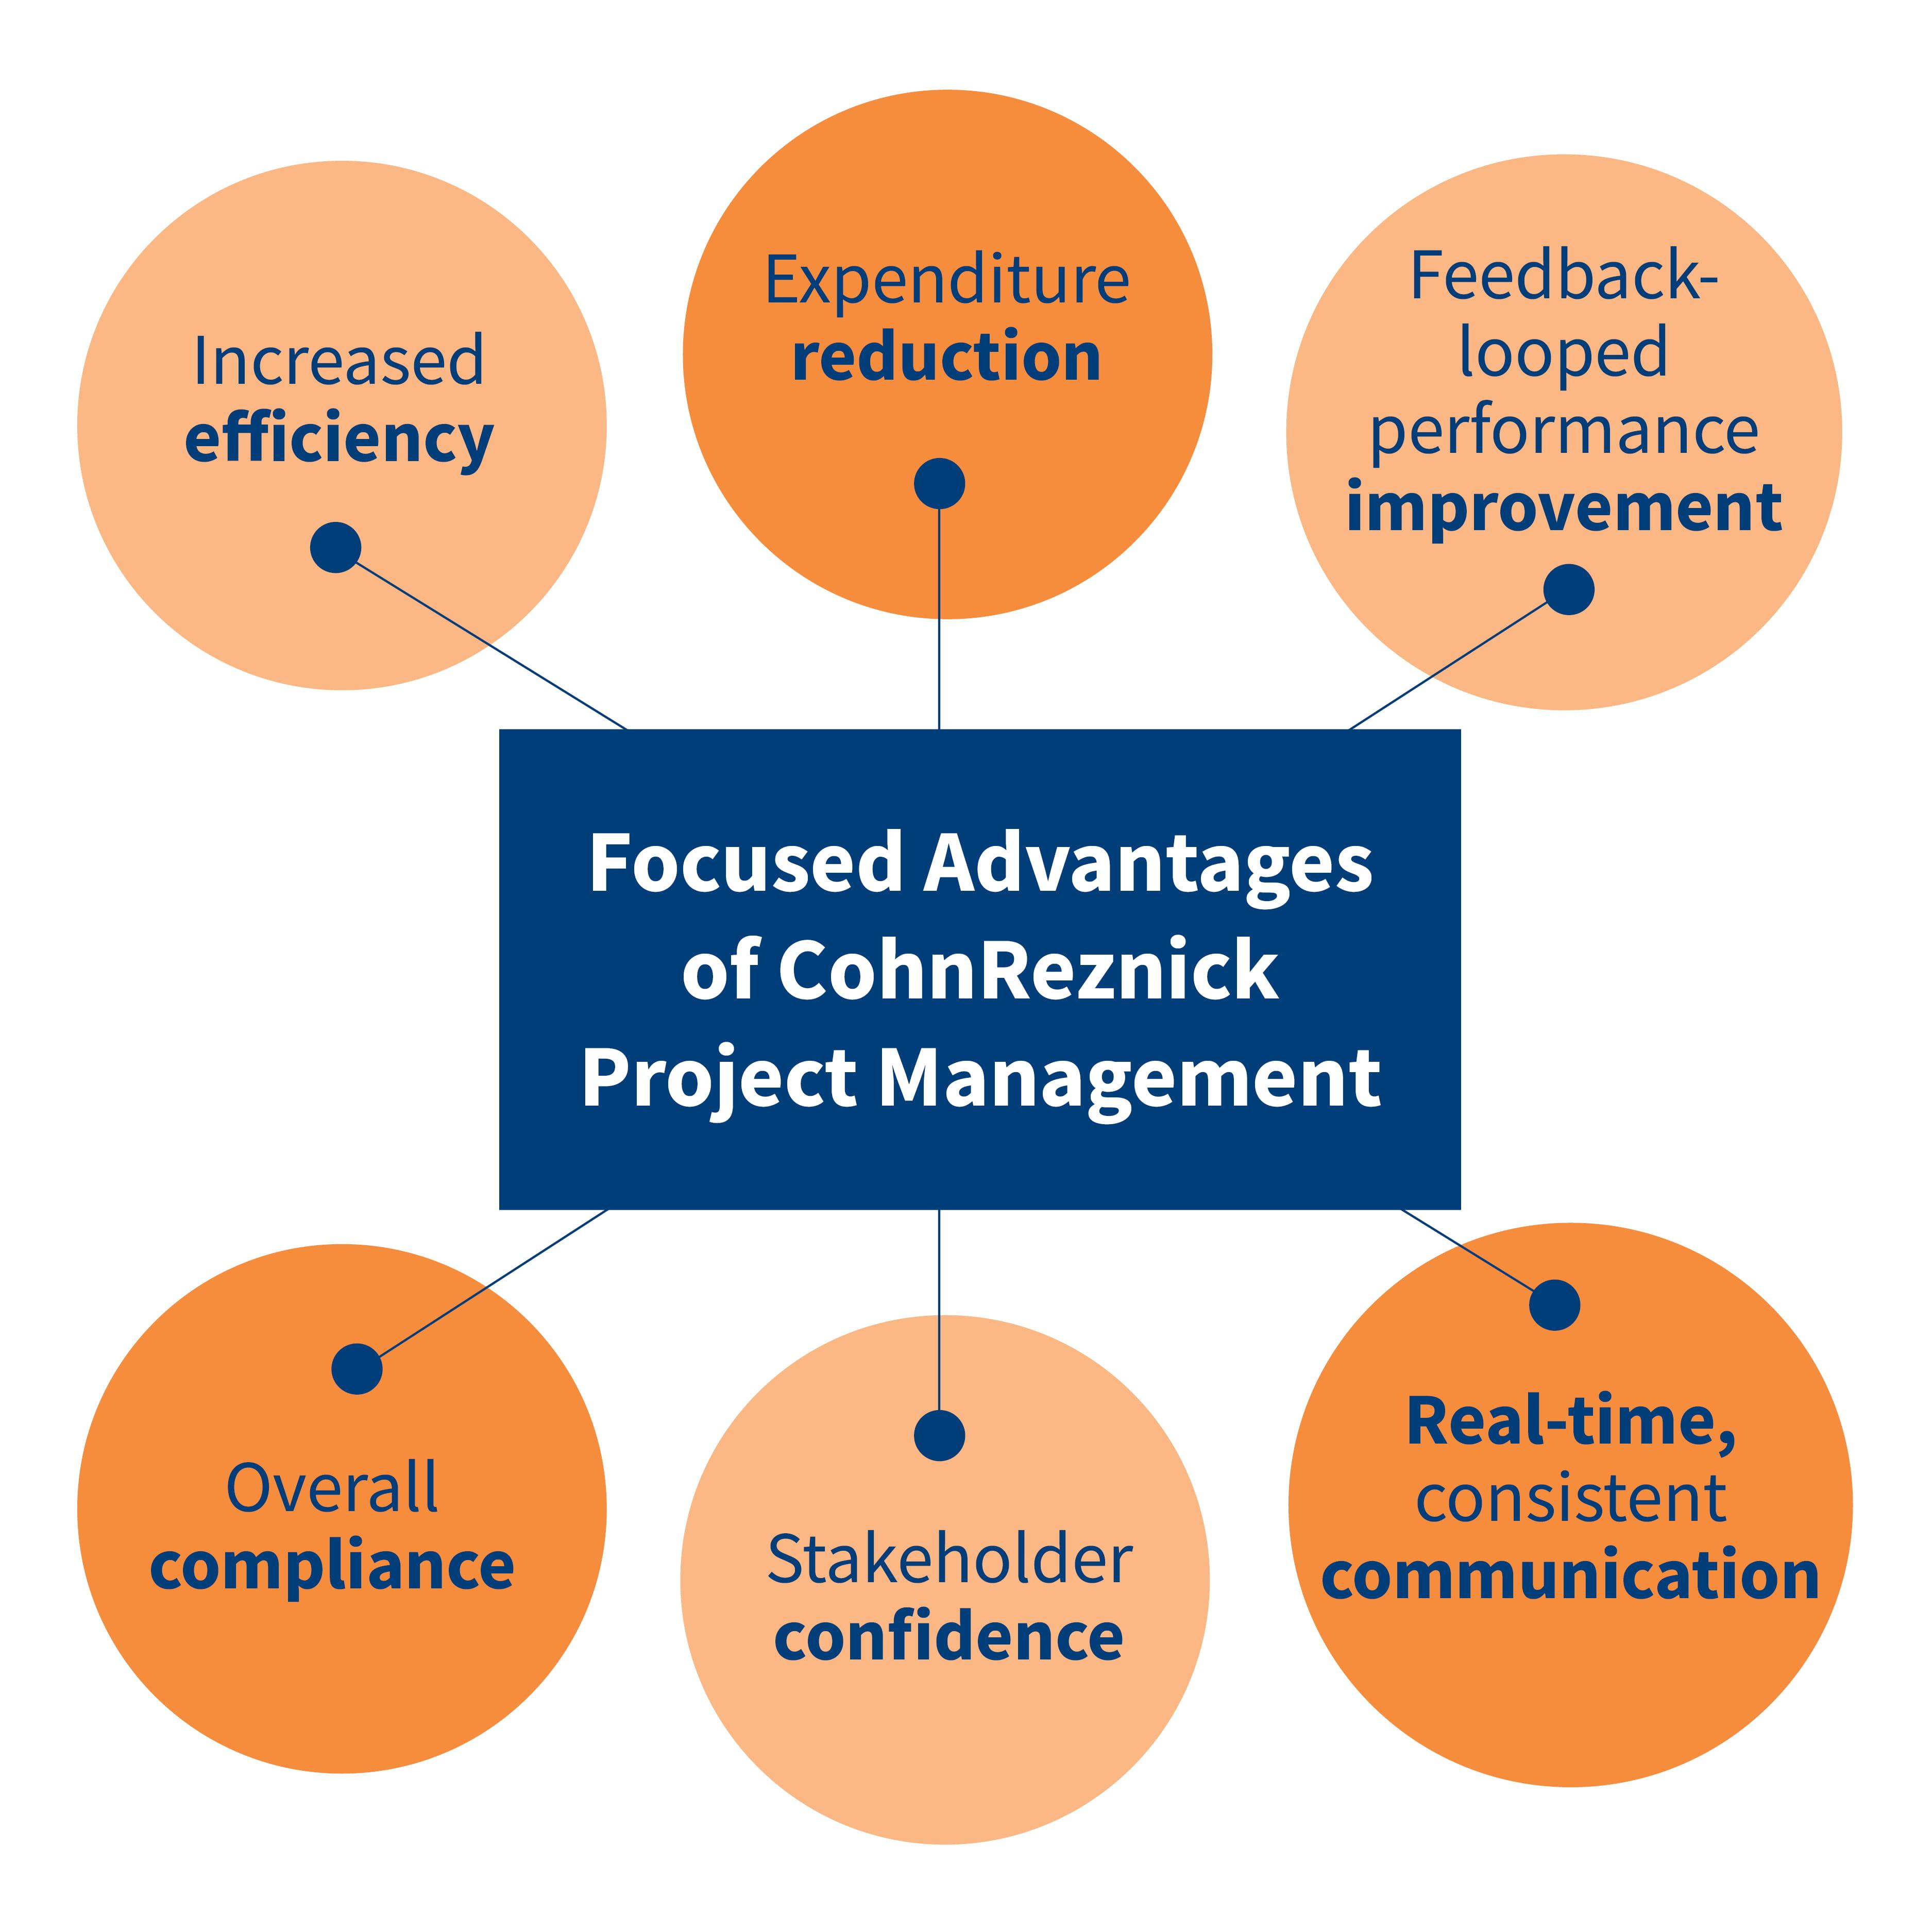 Focused Advantages